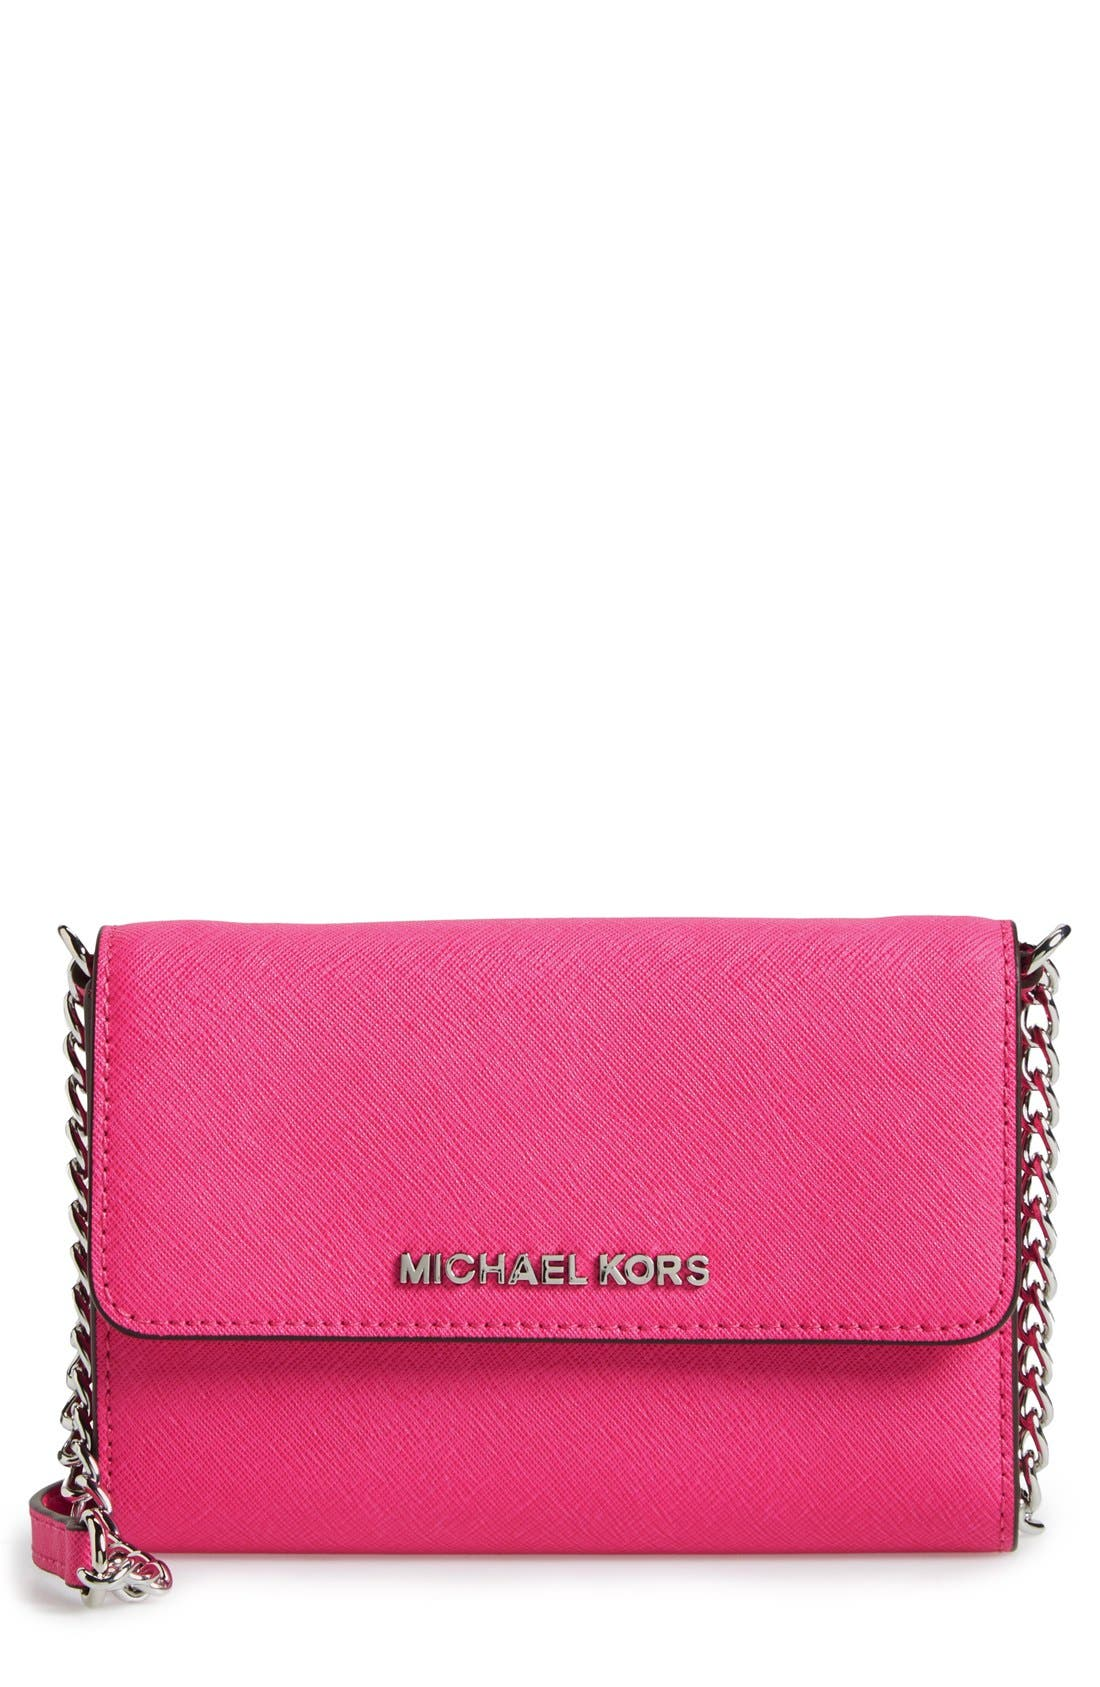 Alternate Image 1 Selected - MICHAEL Michael Kors 'Large Jet Set' Saffiano Leather Crossbody Bag